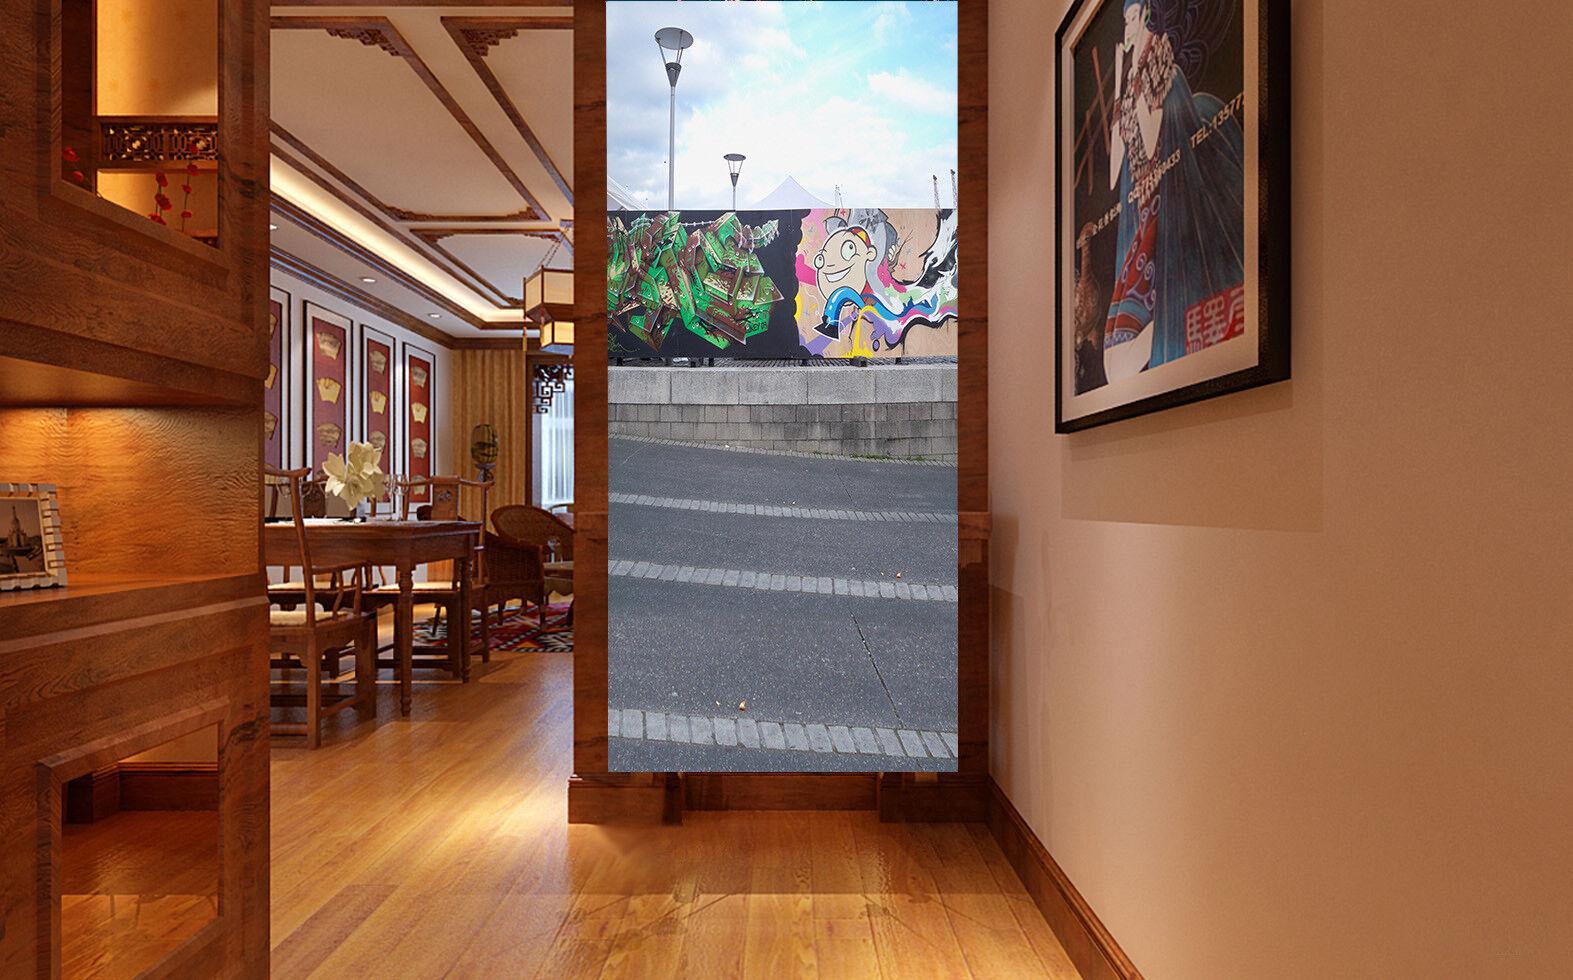 3D Graffiti Street 512 Wall Paper Wall Print Decal Wall Deco Indoor Mural Carly